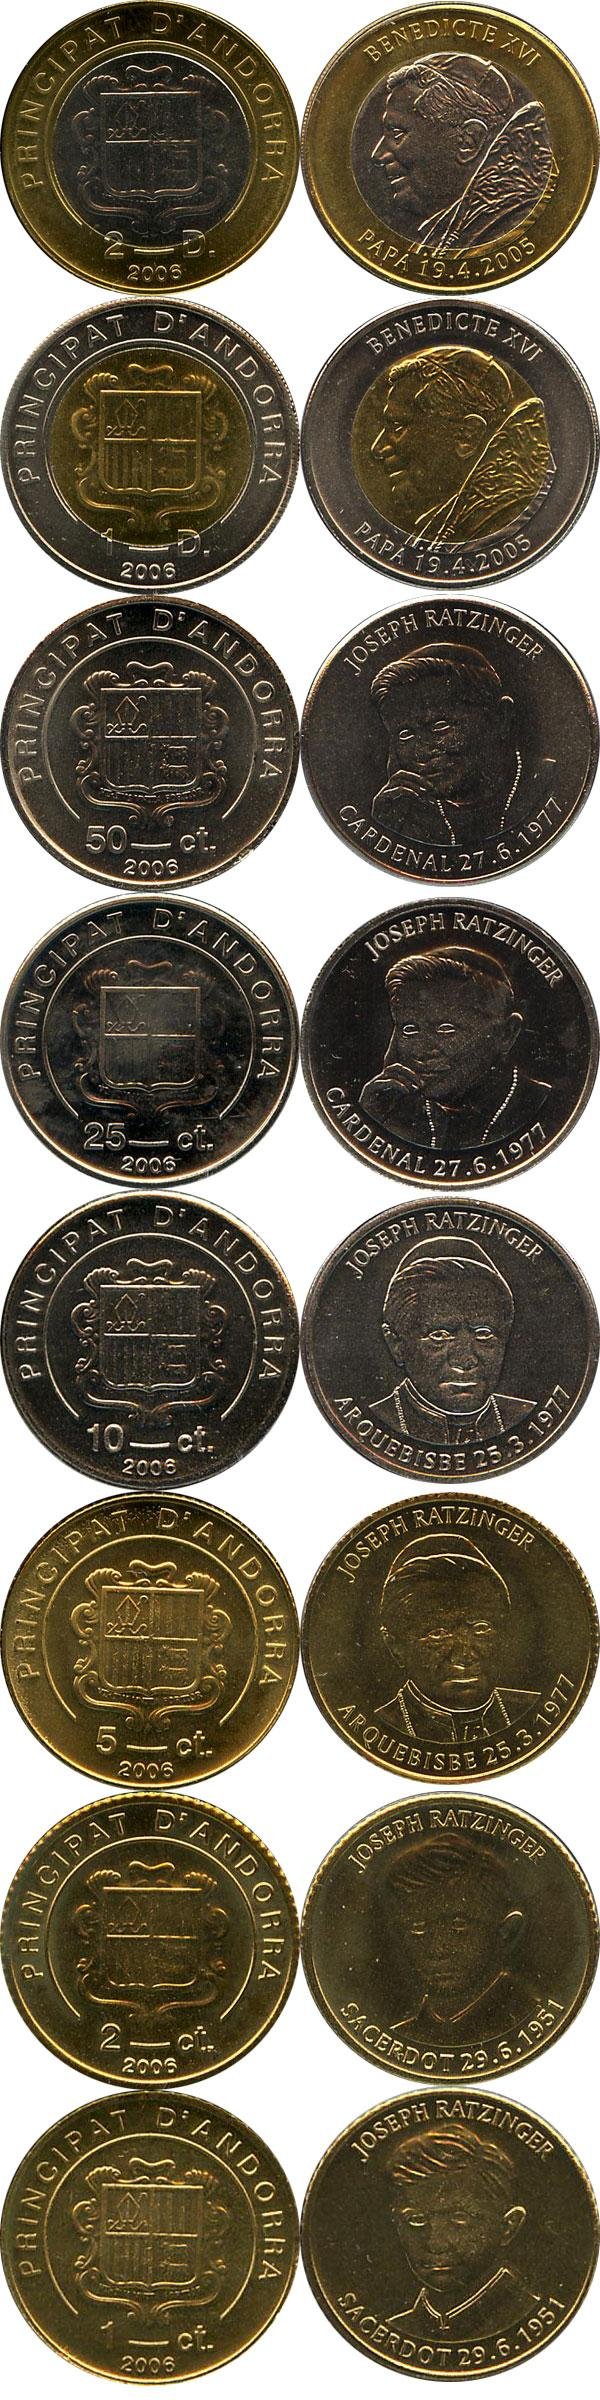 Каталог монет - Андорра Бенедикт 16